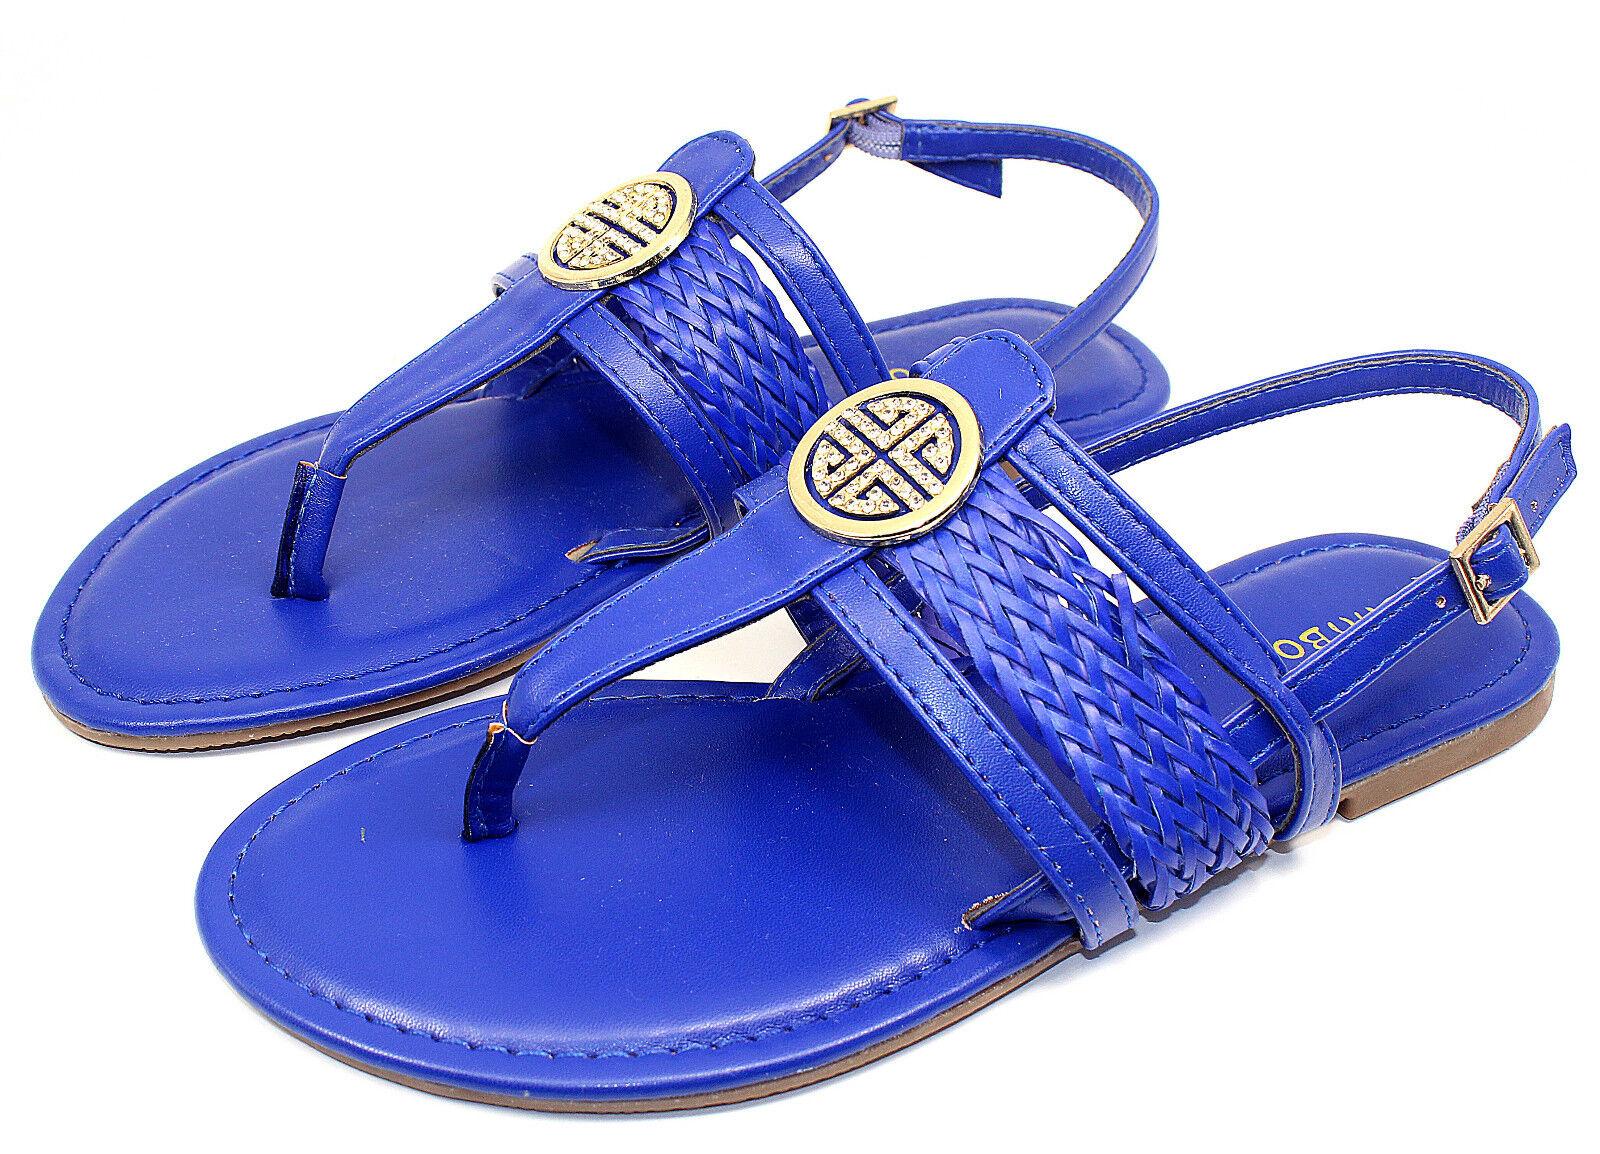 Nadya-15 Gladiator Women Buckles Comfort Flats Strappy Sandals Women Gladiator Shoes Blue 8 9615eb